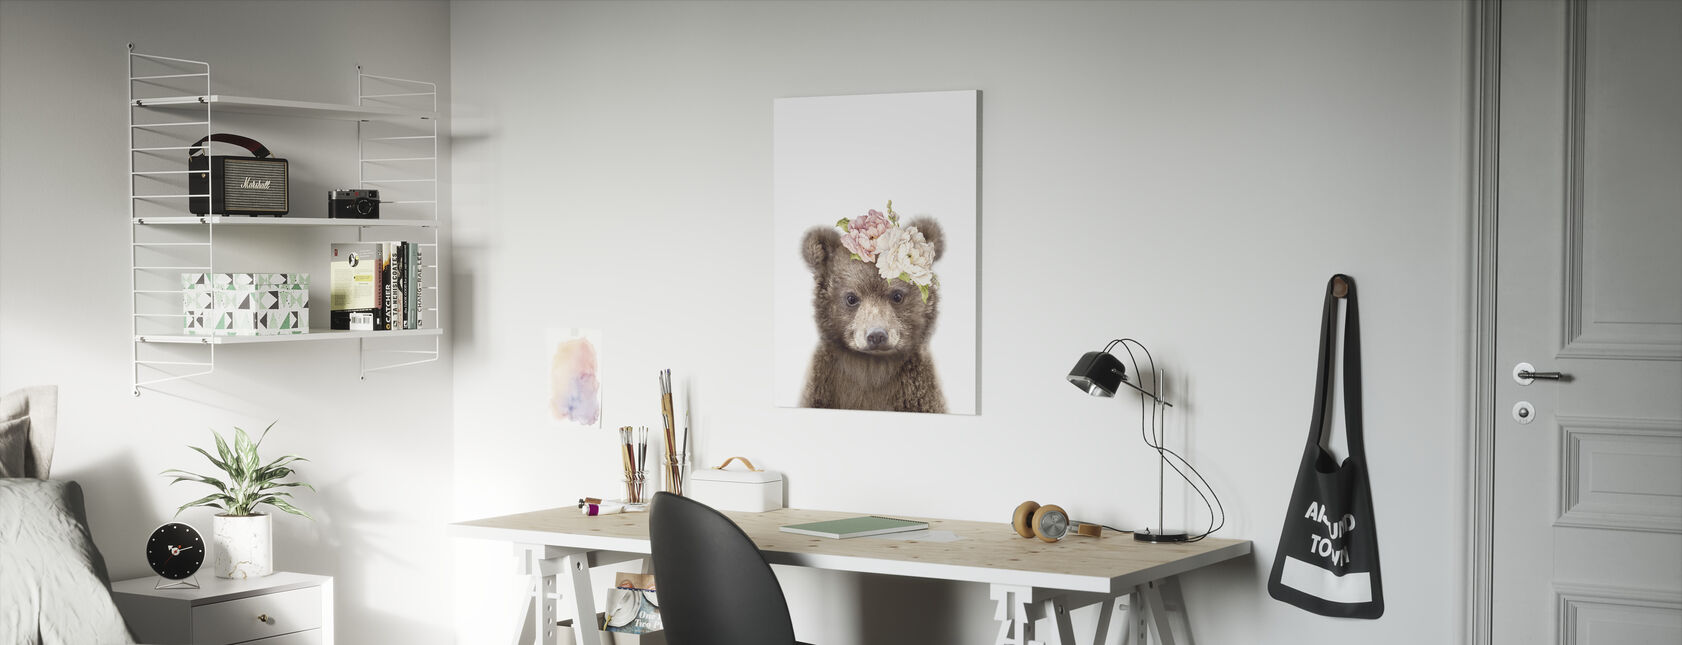 Floral Baby Bear - Canvas print - Kids Room